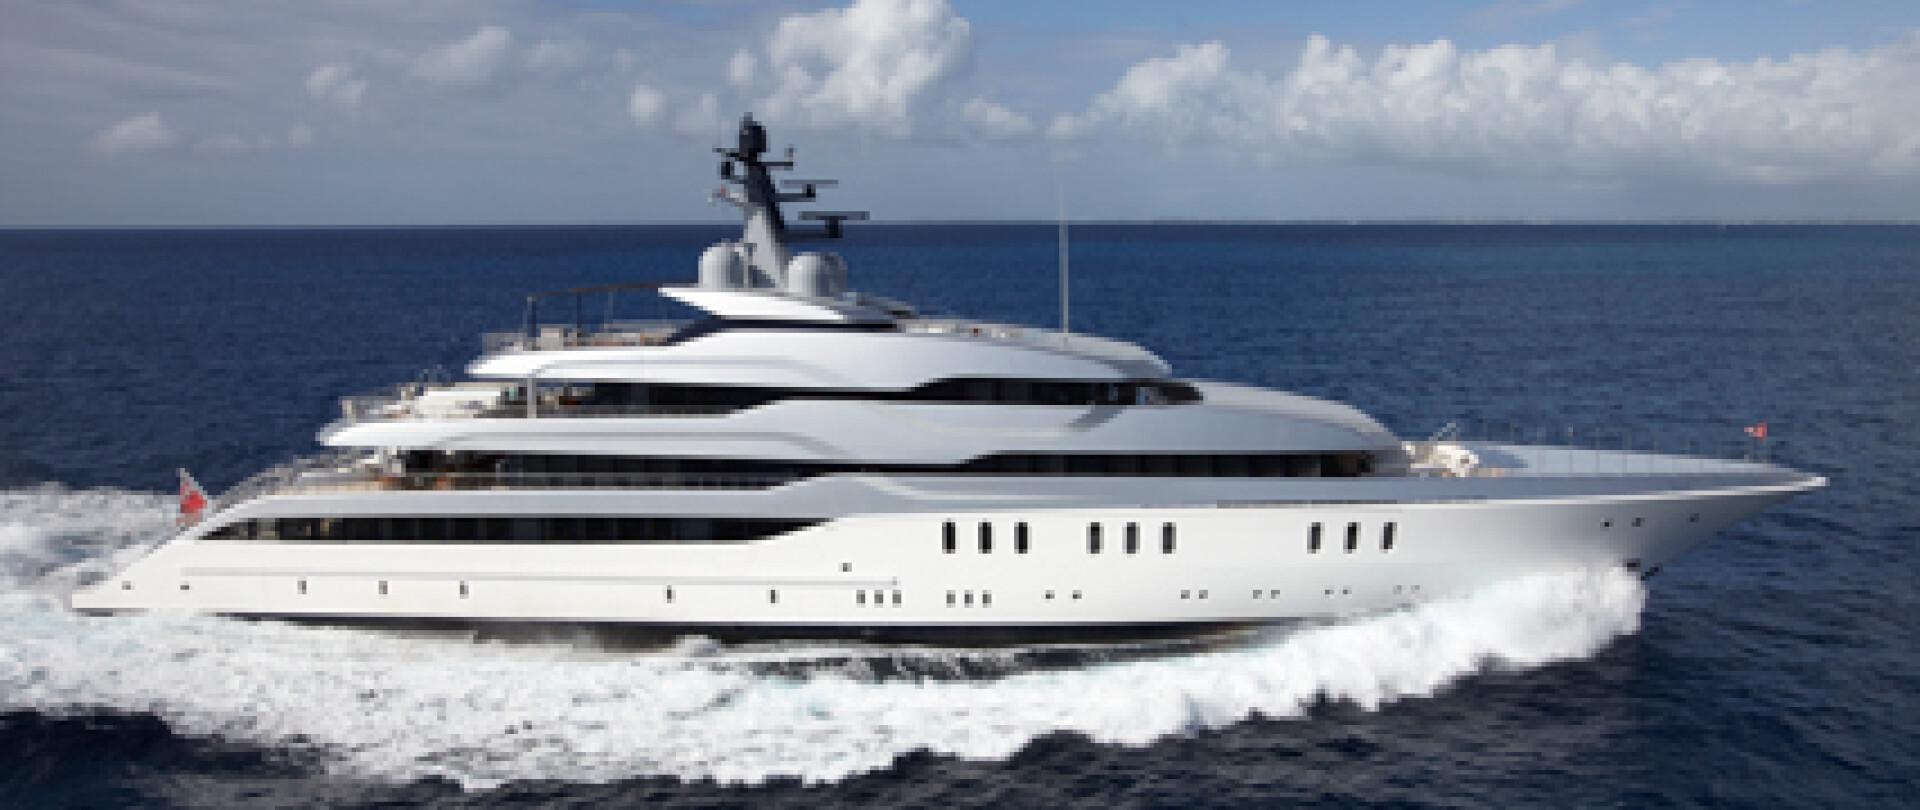 M/Y TANGO wins Motor yacht of the year award photo 1